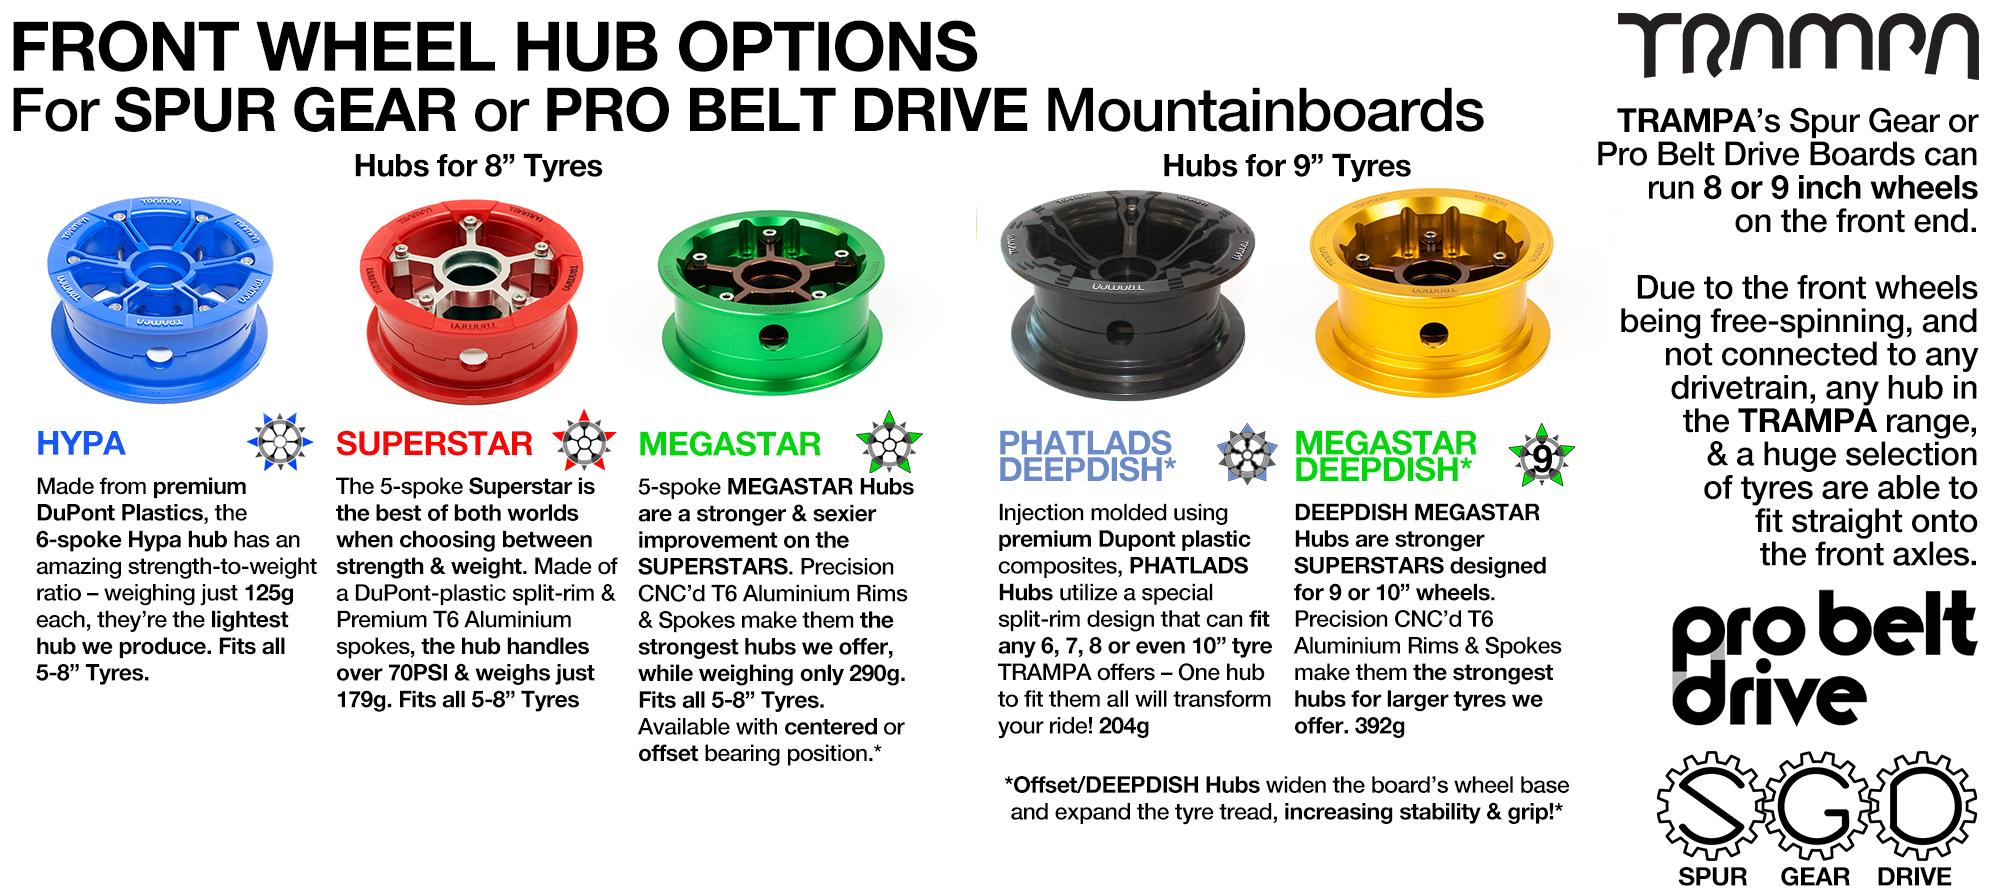 FRONT Wheel Hub options for SPUR GEAR & PRO BELT Boards